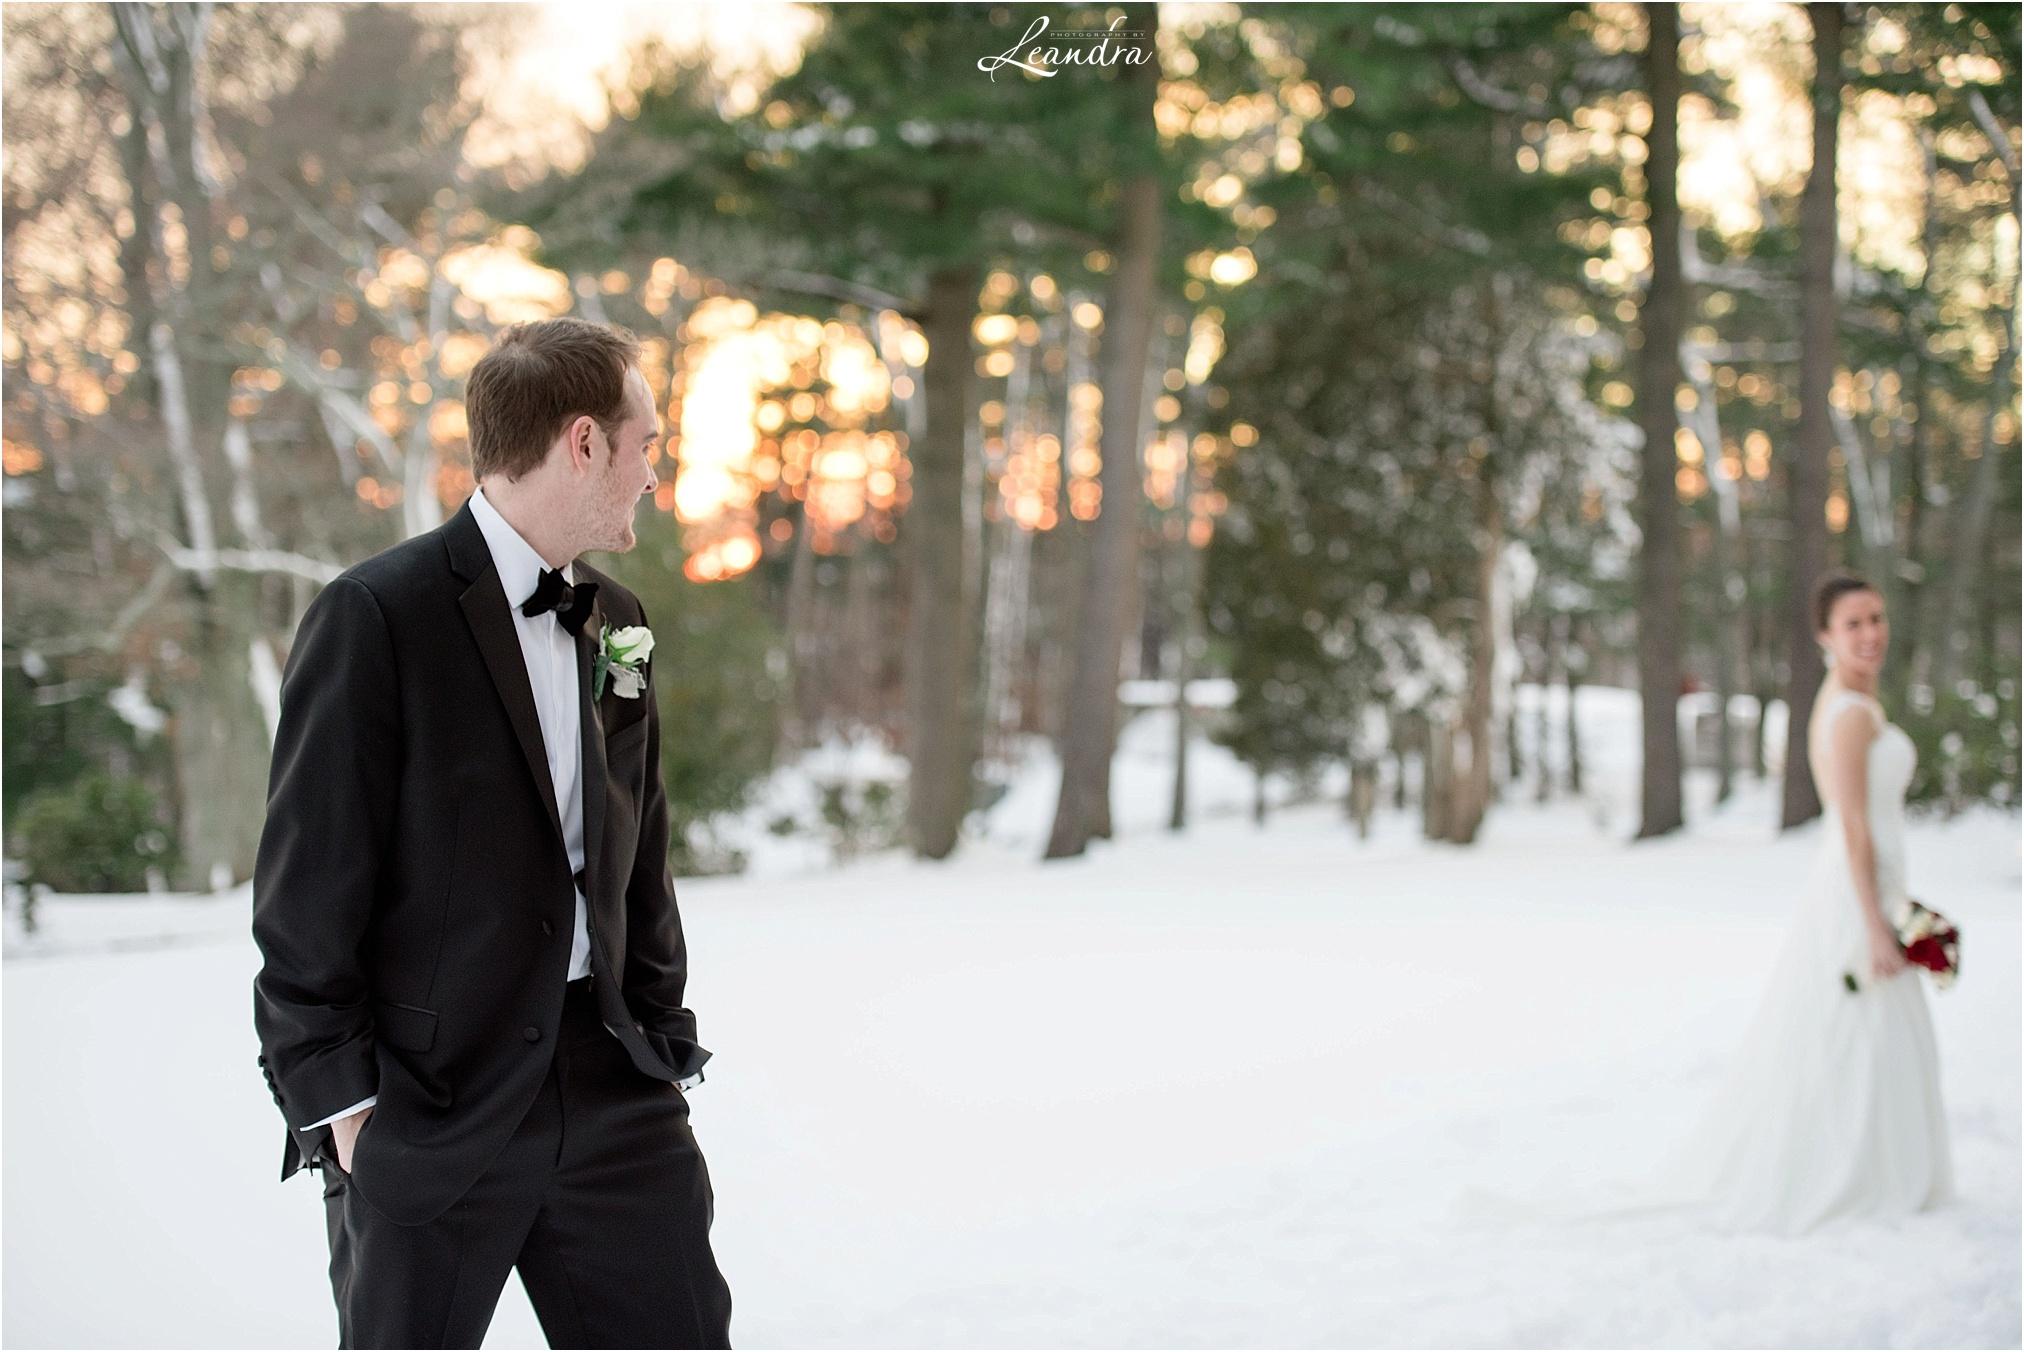 Stonebridge Country Club Wedding Bride and Groom in Snow_0033.jpg